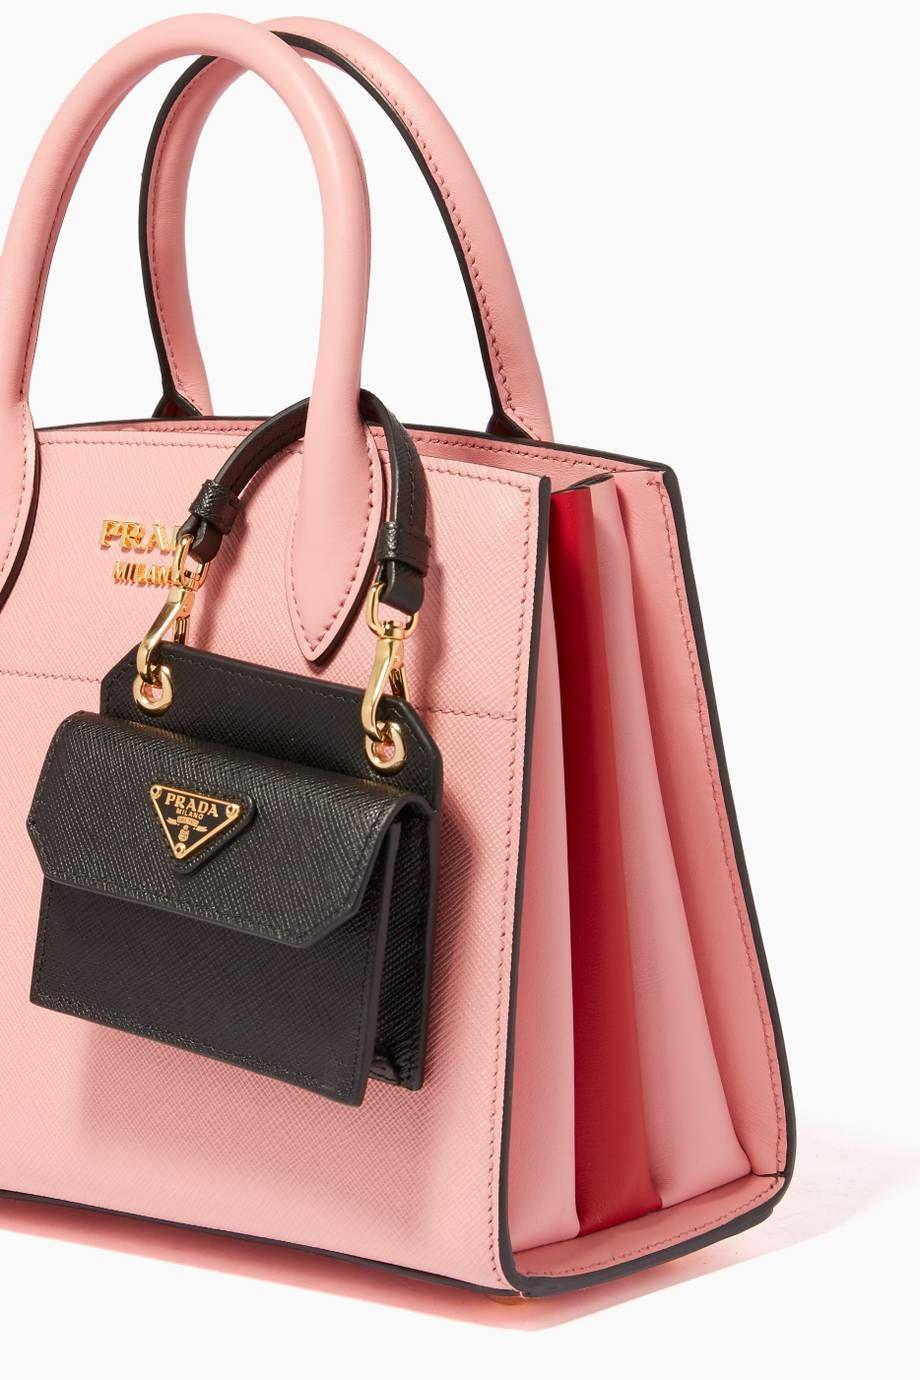 b0ce279e5ce3 Shop Luxury Prada Black Saffiano Leather Bag Charm   Ounass UAE ...